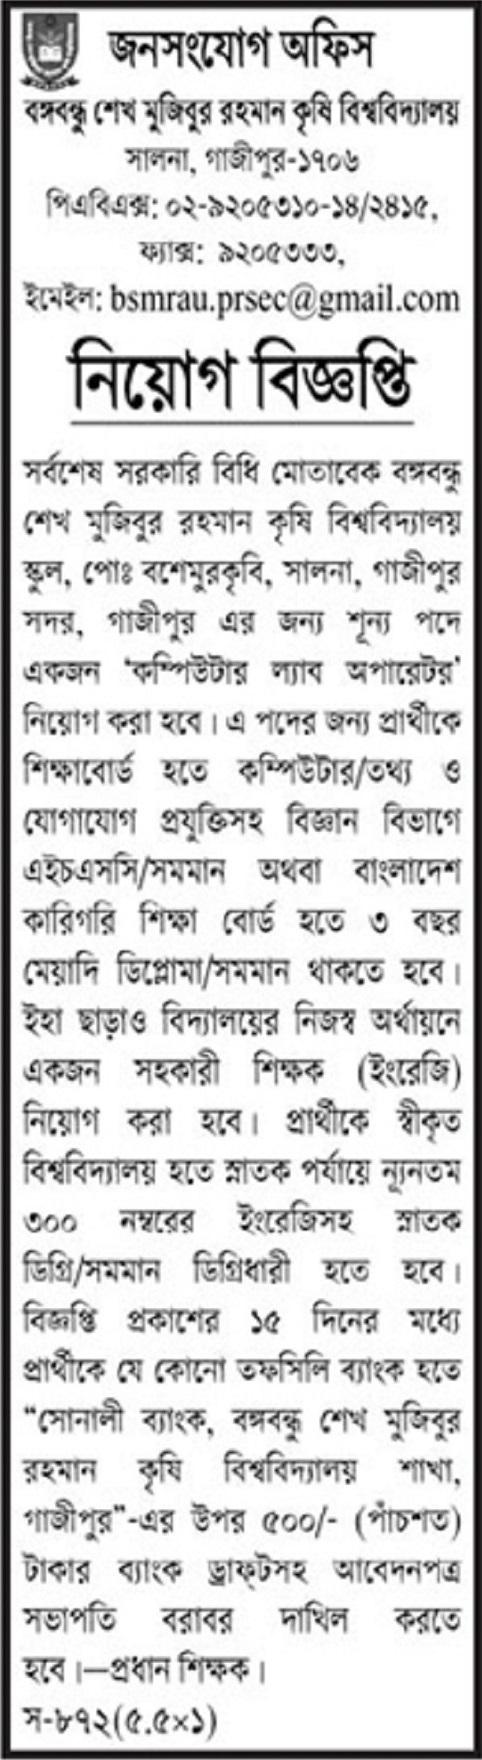 Bangabandhu Sheikh Mujibur Rahman Agricultural University Job Circular April 2021